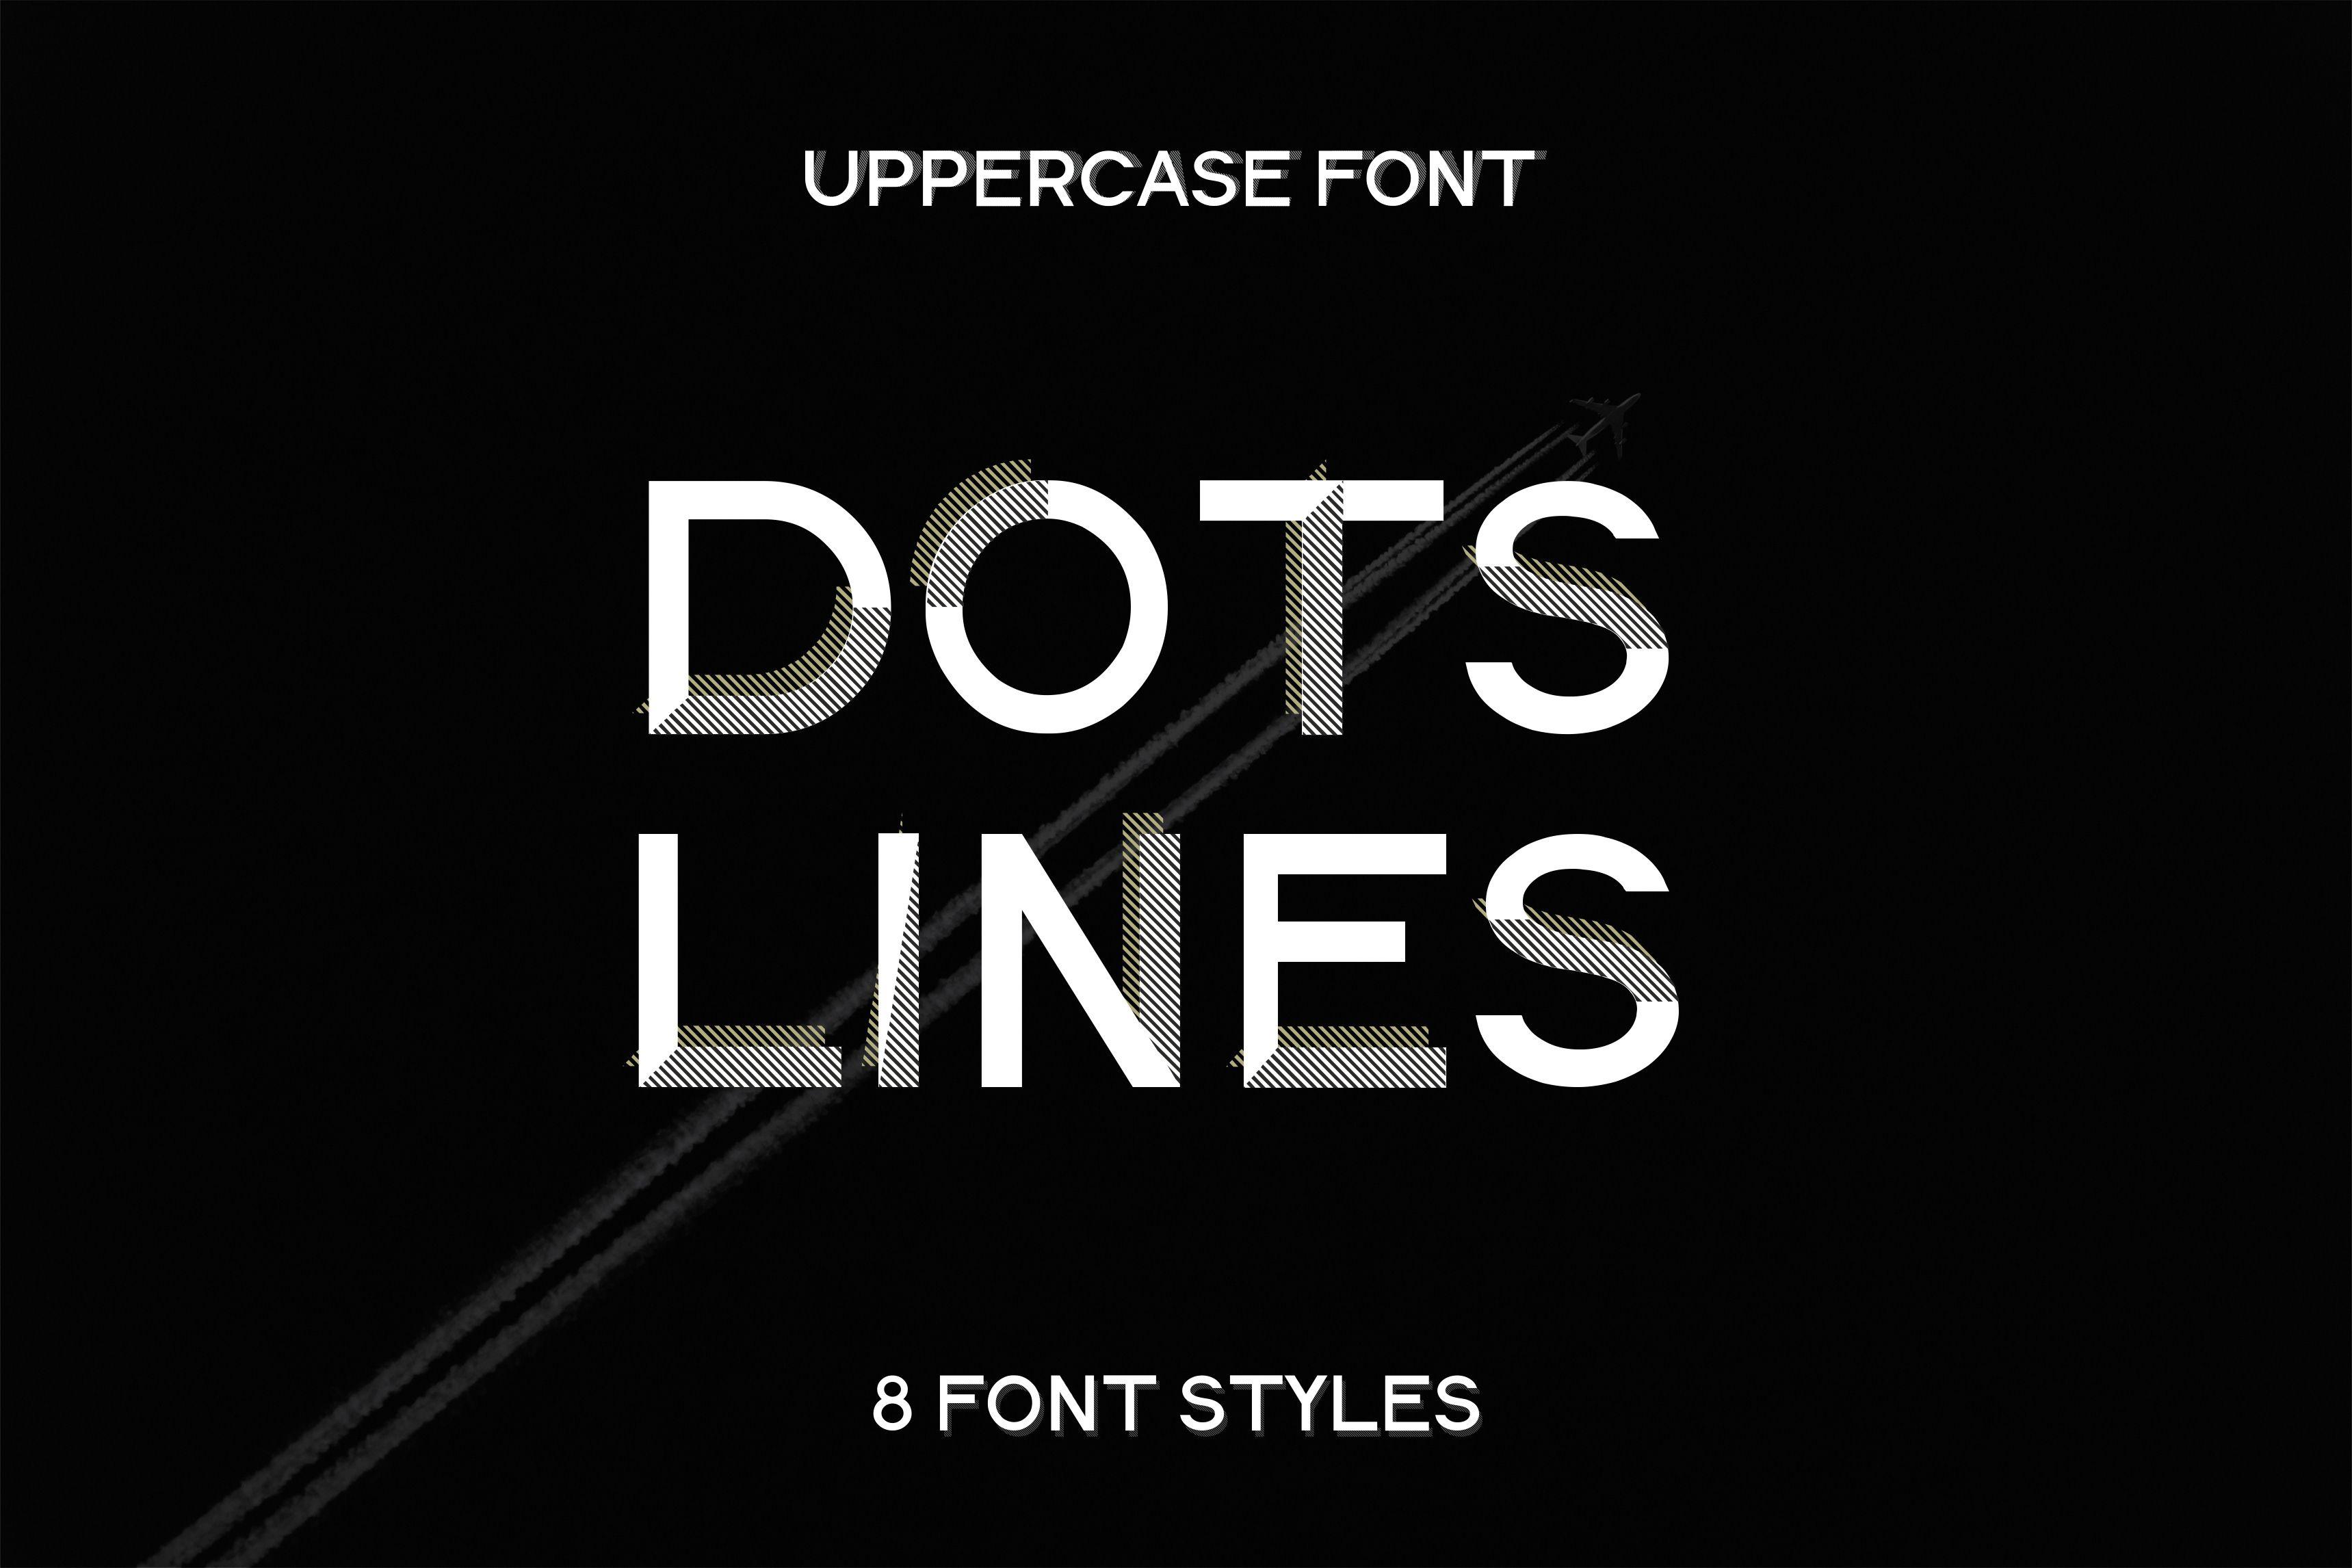 Font design«Dots Lines font. Modern, minimalist, uppercase